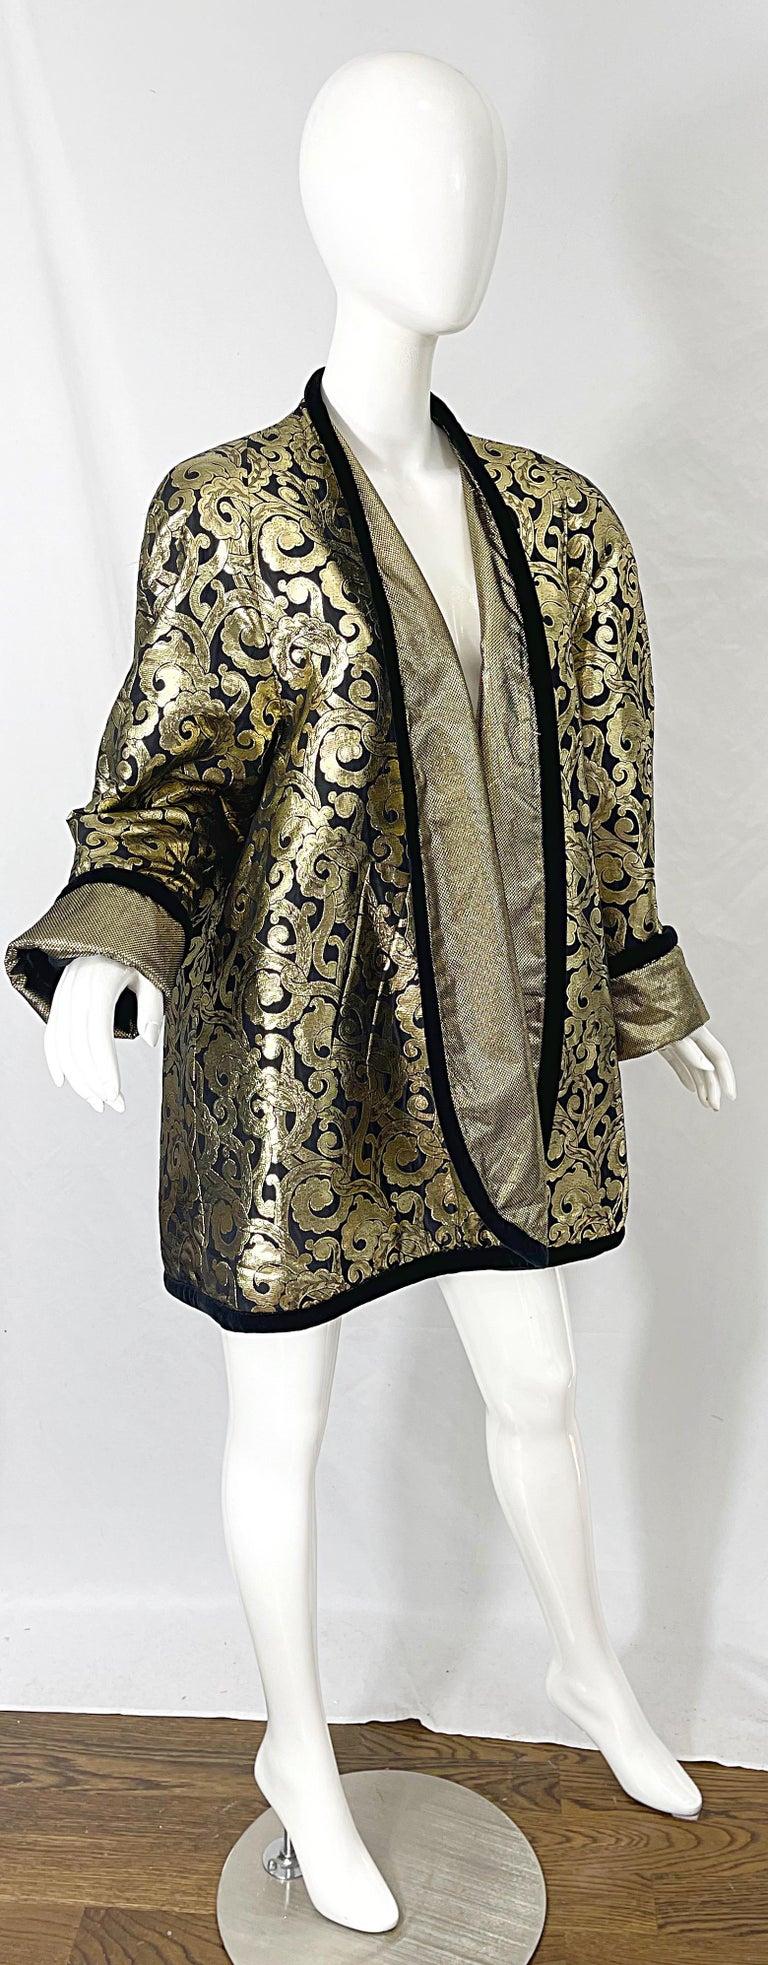 Vintage Escada Margaretha Ley 1980s Gold Black Silk 80s Swing Jacket Coat 9